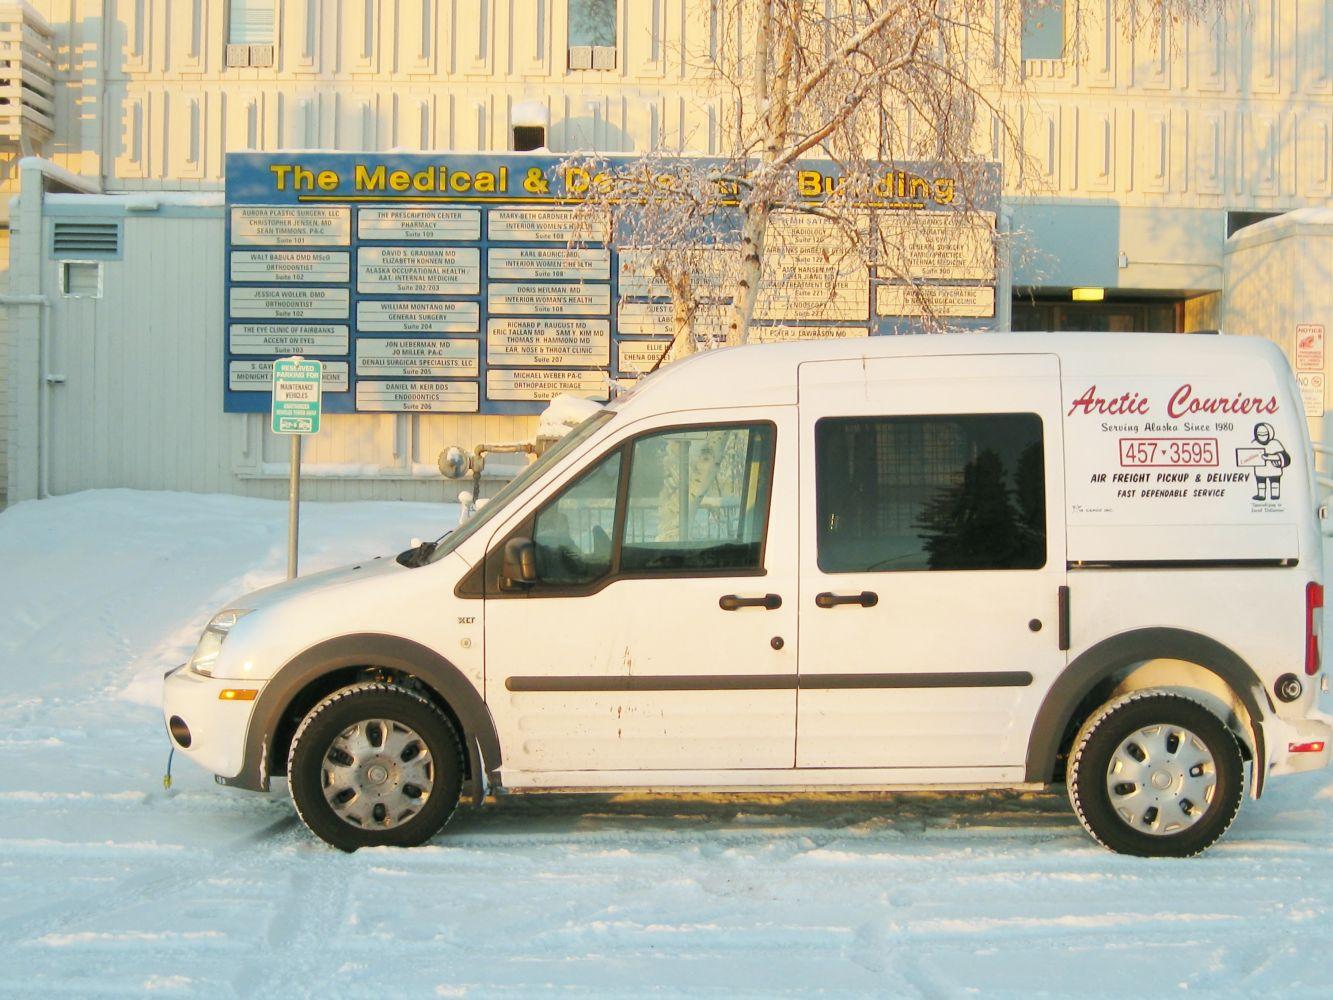 Providing medical courier service